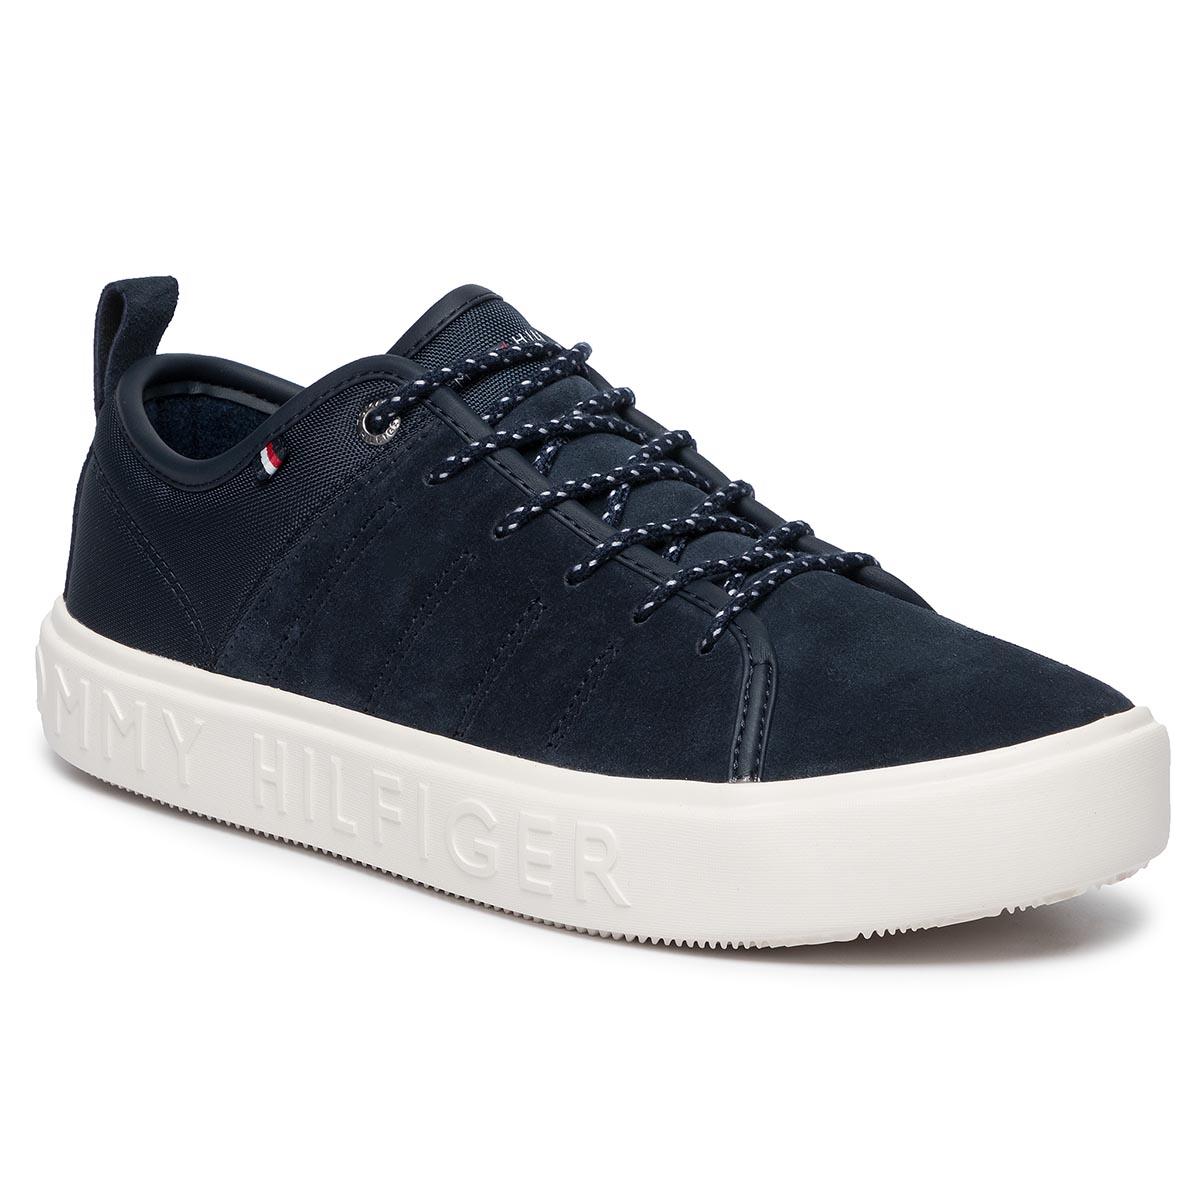 Plimsolls TOMMY HILFIGER Corporate Leather Sneaker FM0FM02285 Black 950